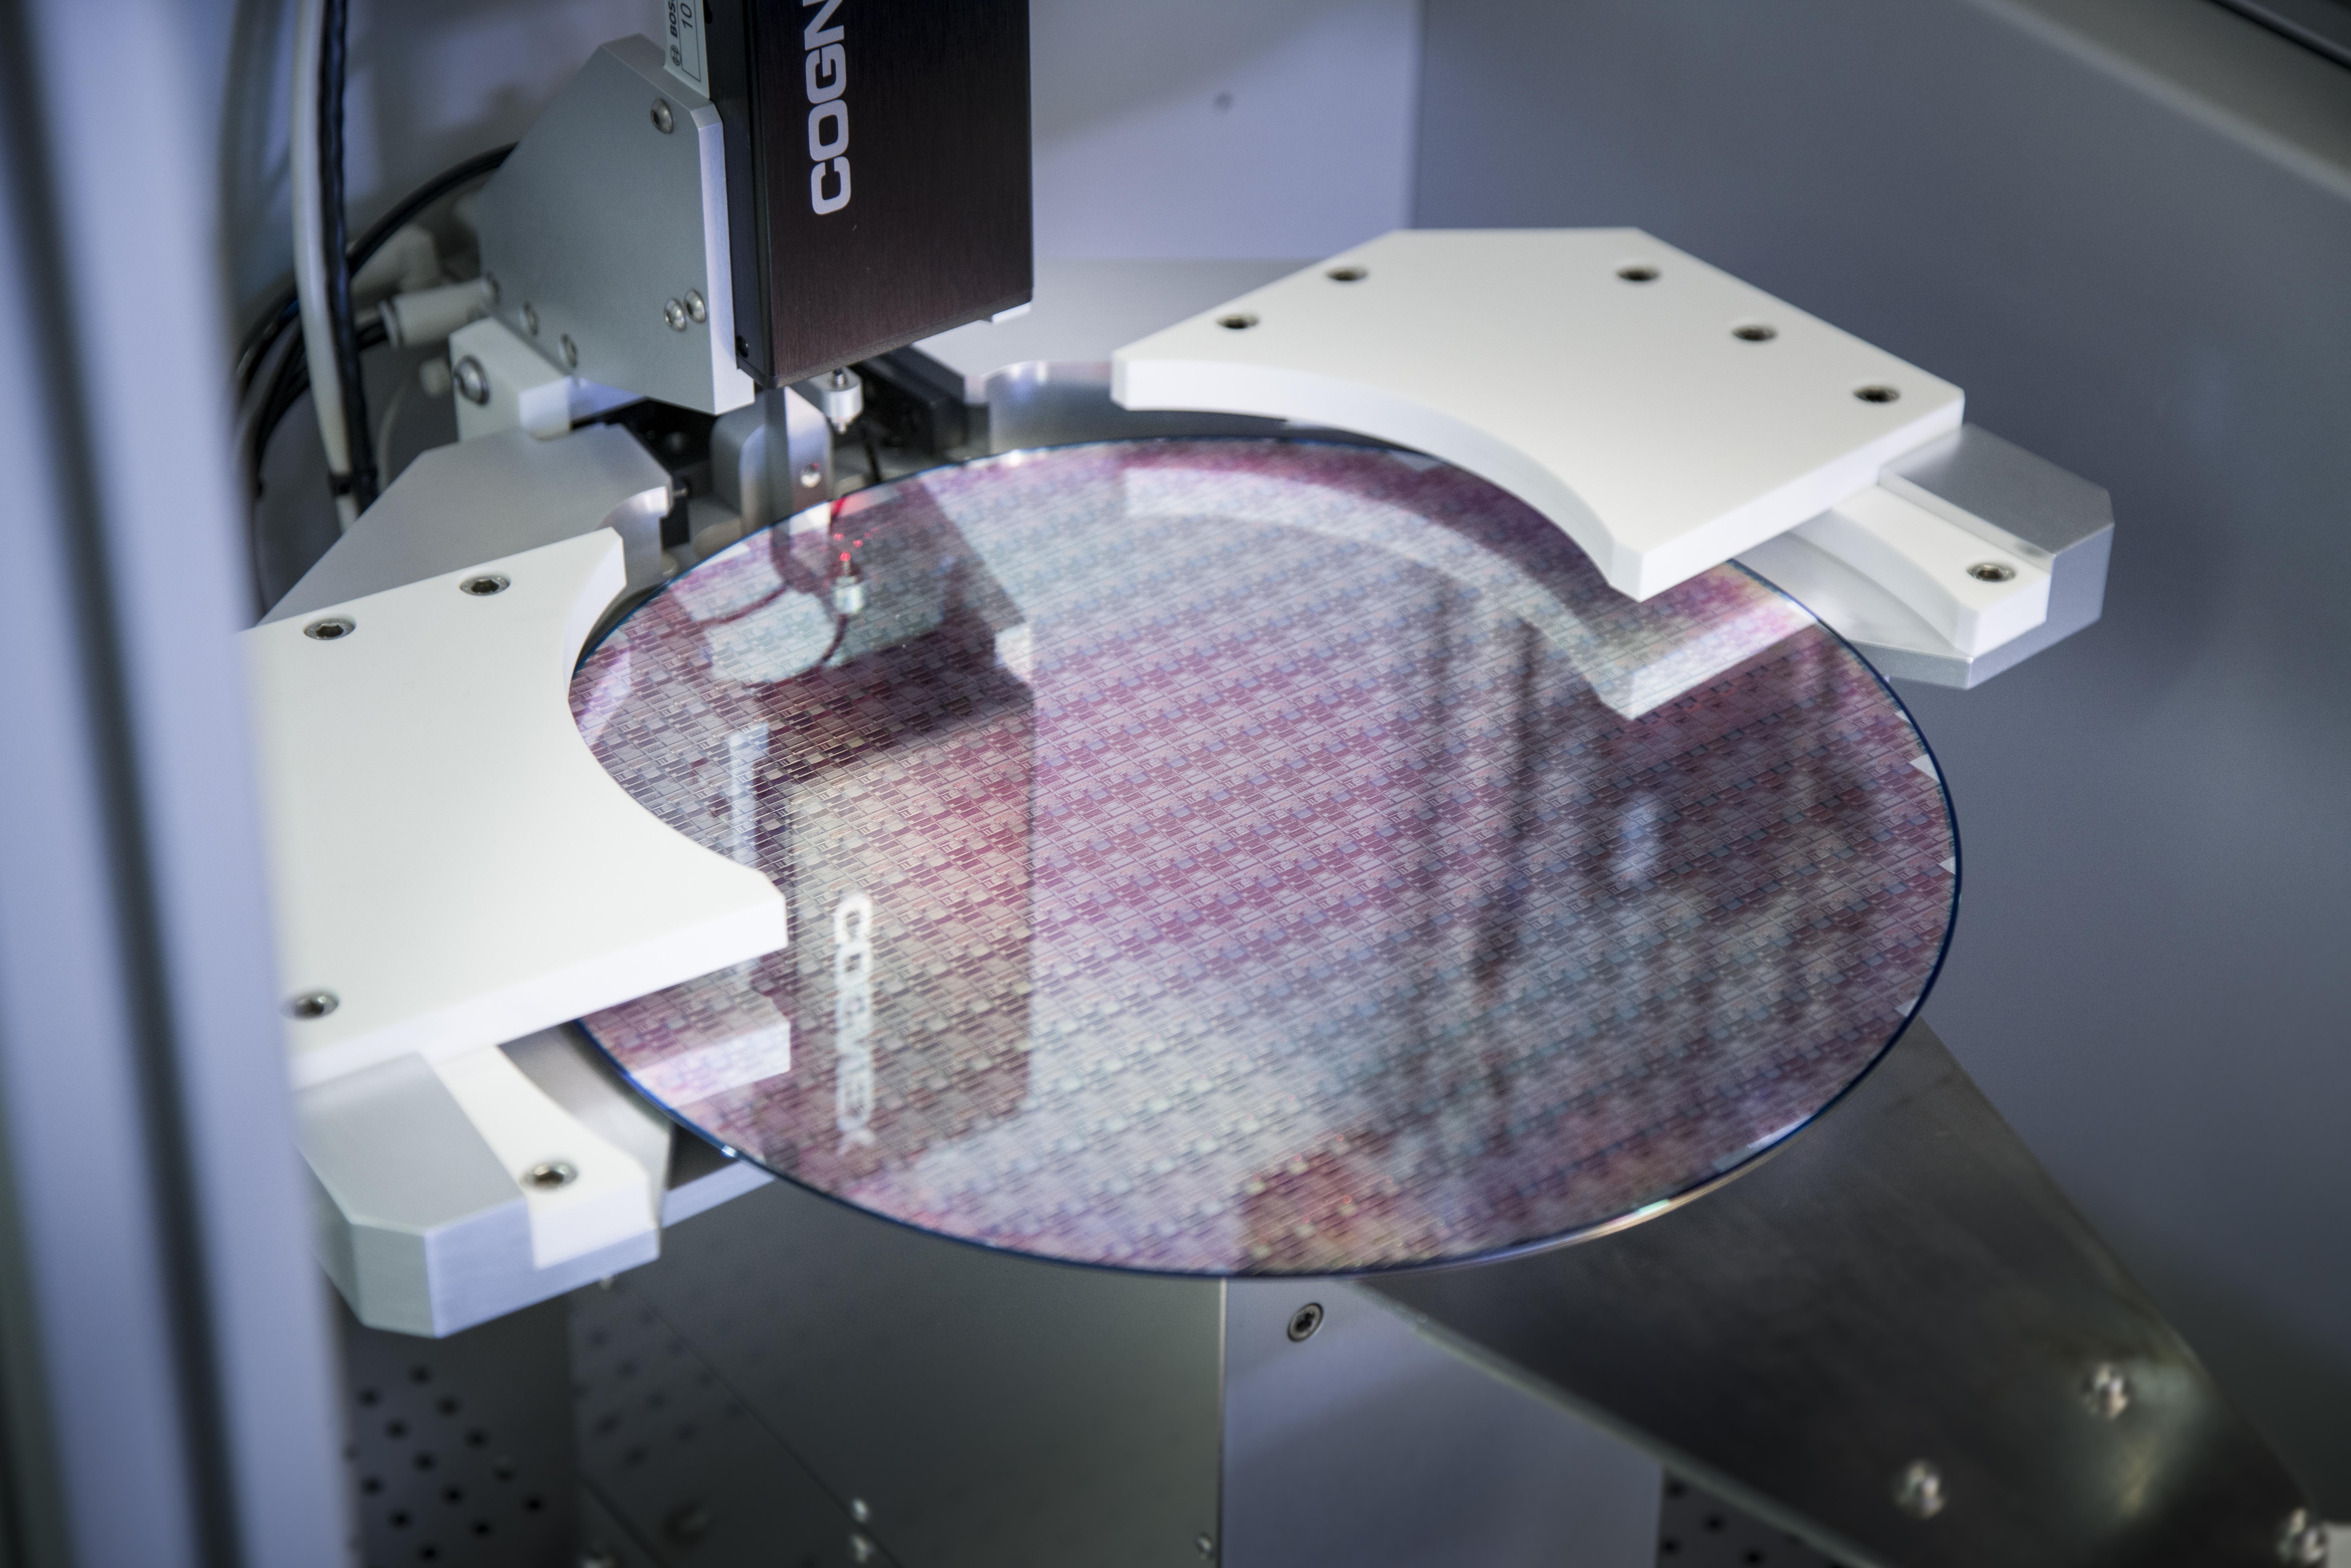 Halbleiterfertigung in 300-Millimeter-Technologie